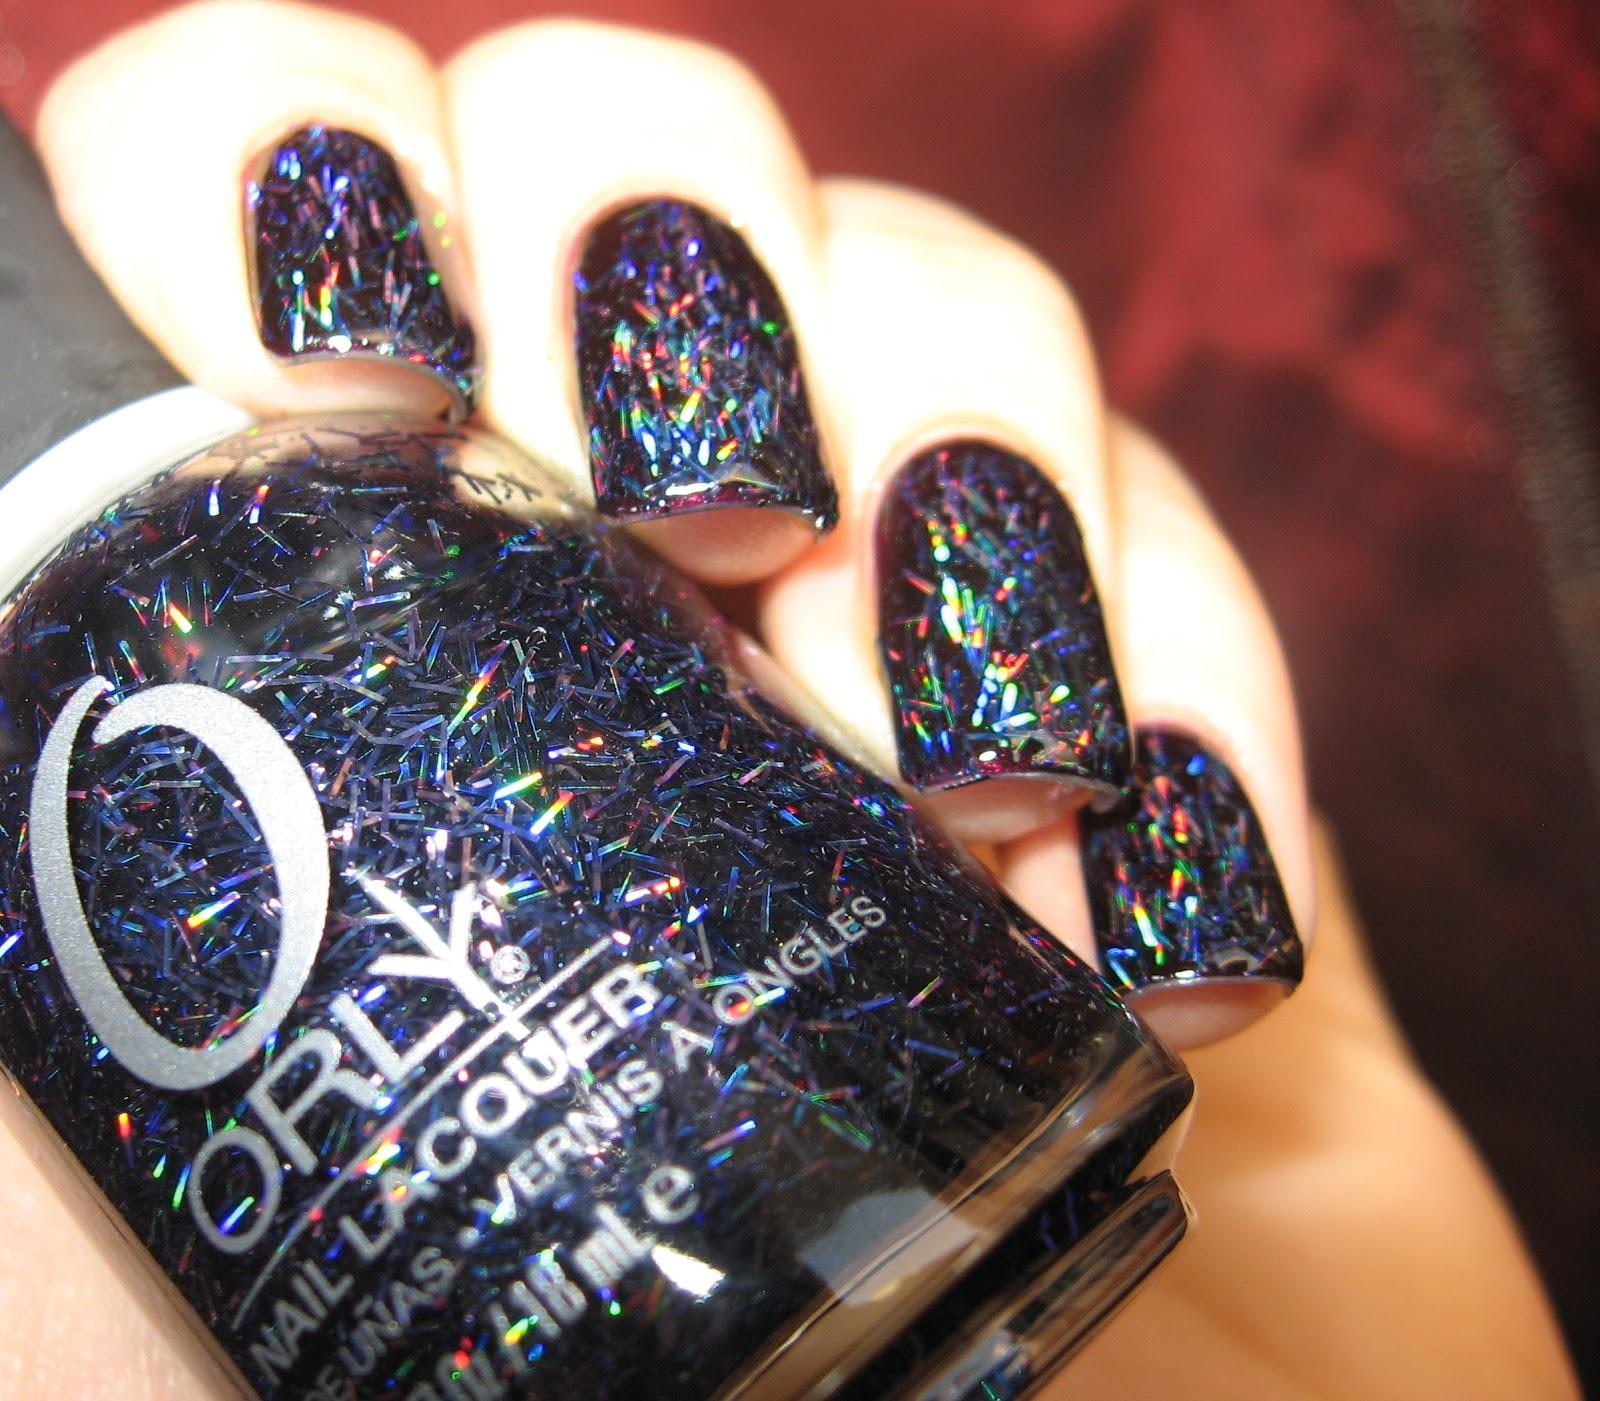 Orly Sunglasses At Night Navy Dark Blue Holo Holographic Glitter Nail Polish Ebay